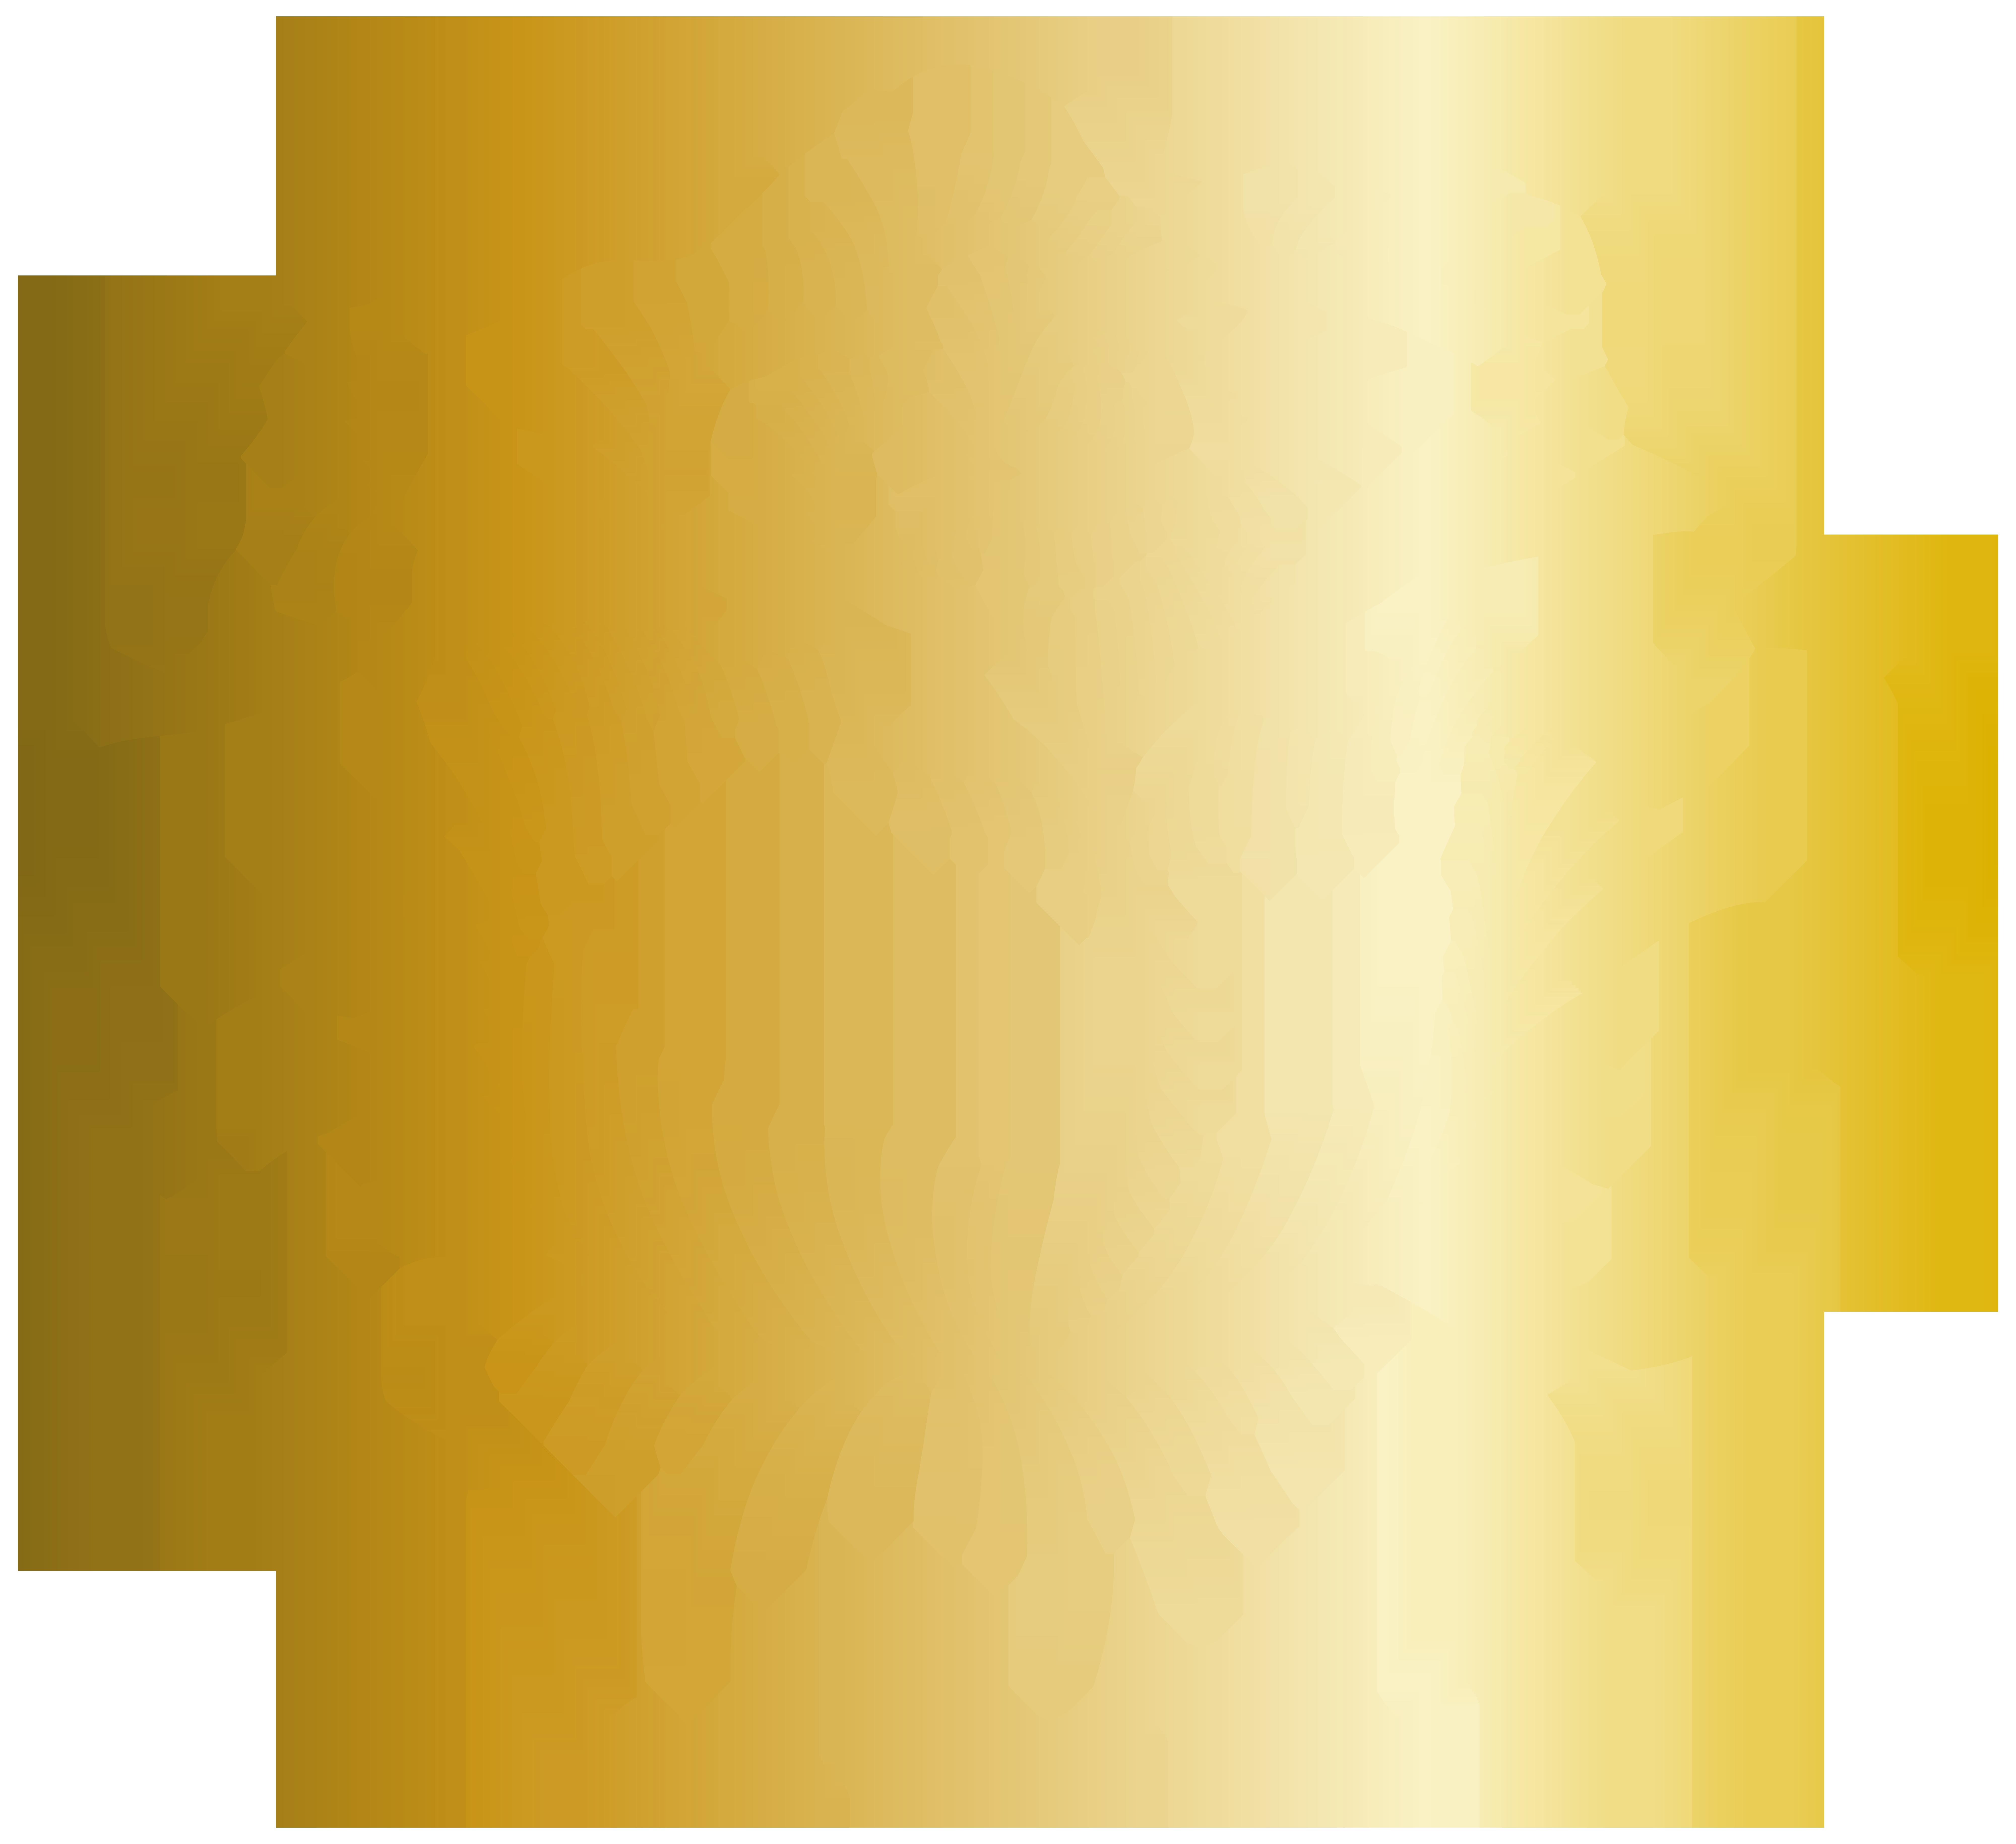 Ballroom flower clipart vector library library Golden Rose PNG Clip Art Image | Roses | Pinterest | Clip art vector library library